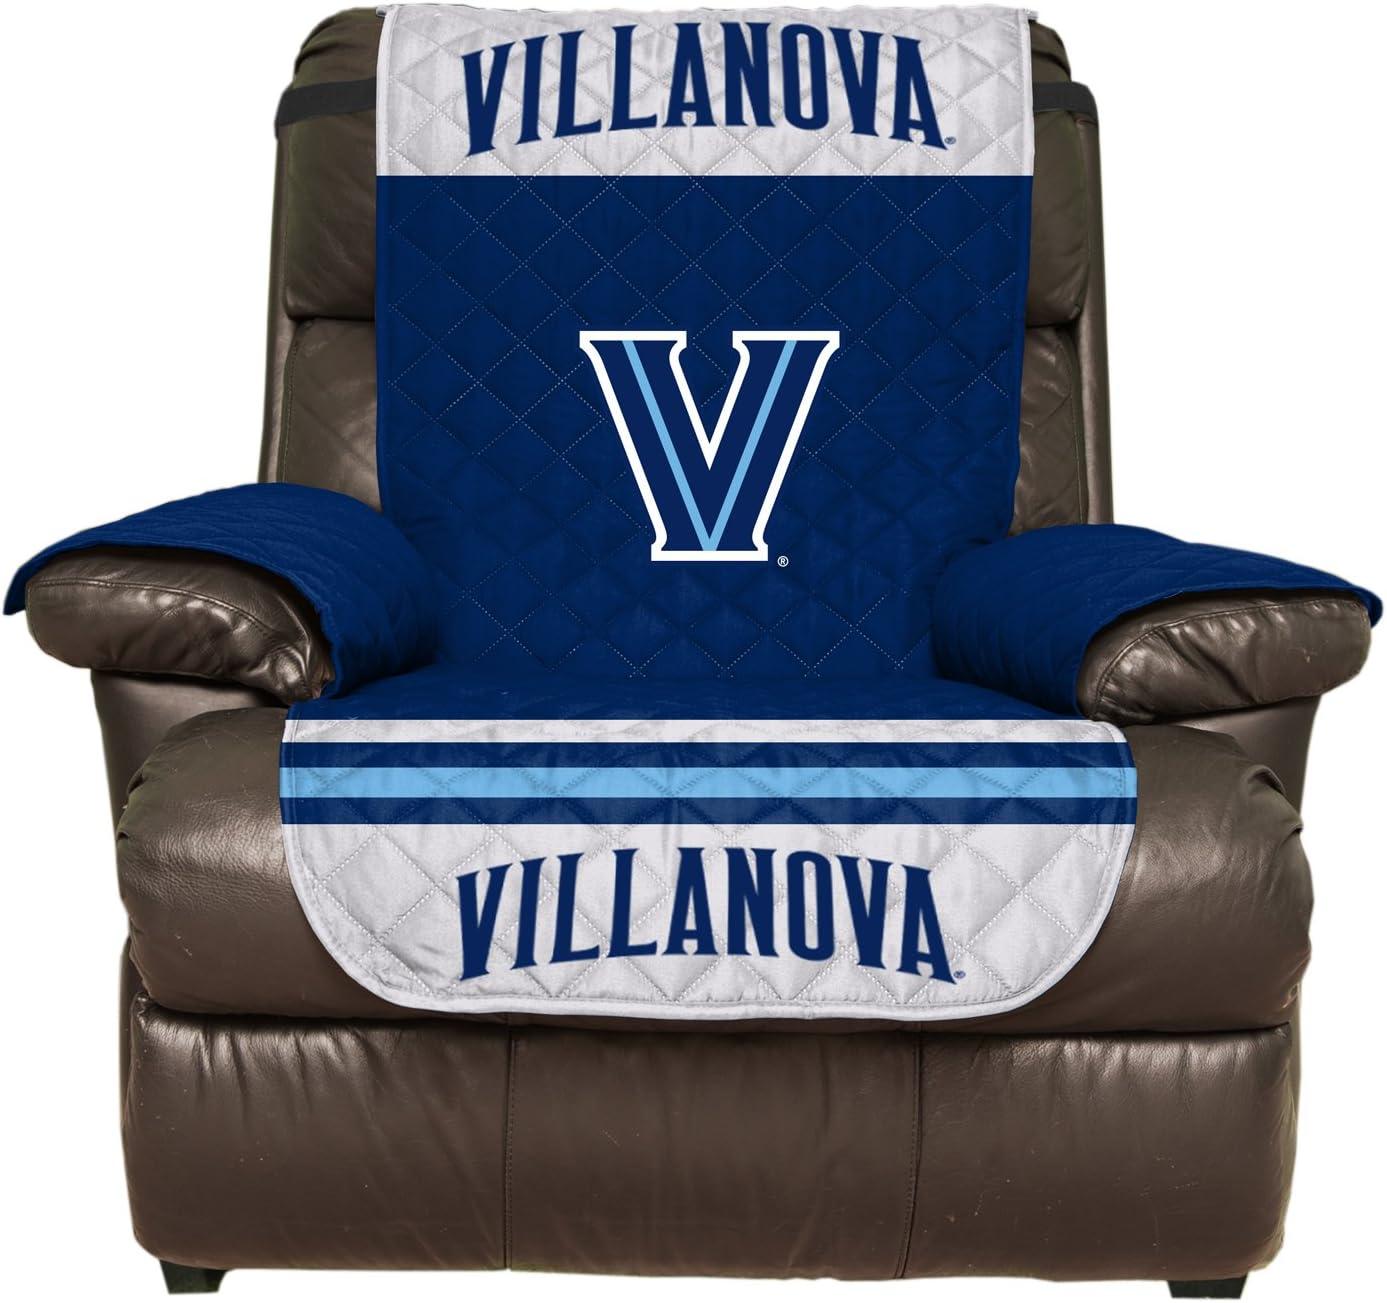 Villanova Wildcats Pegasus Sports NCAA Microfiber Furniture Protector Cover with Elastic Straps Recliner